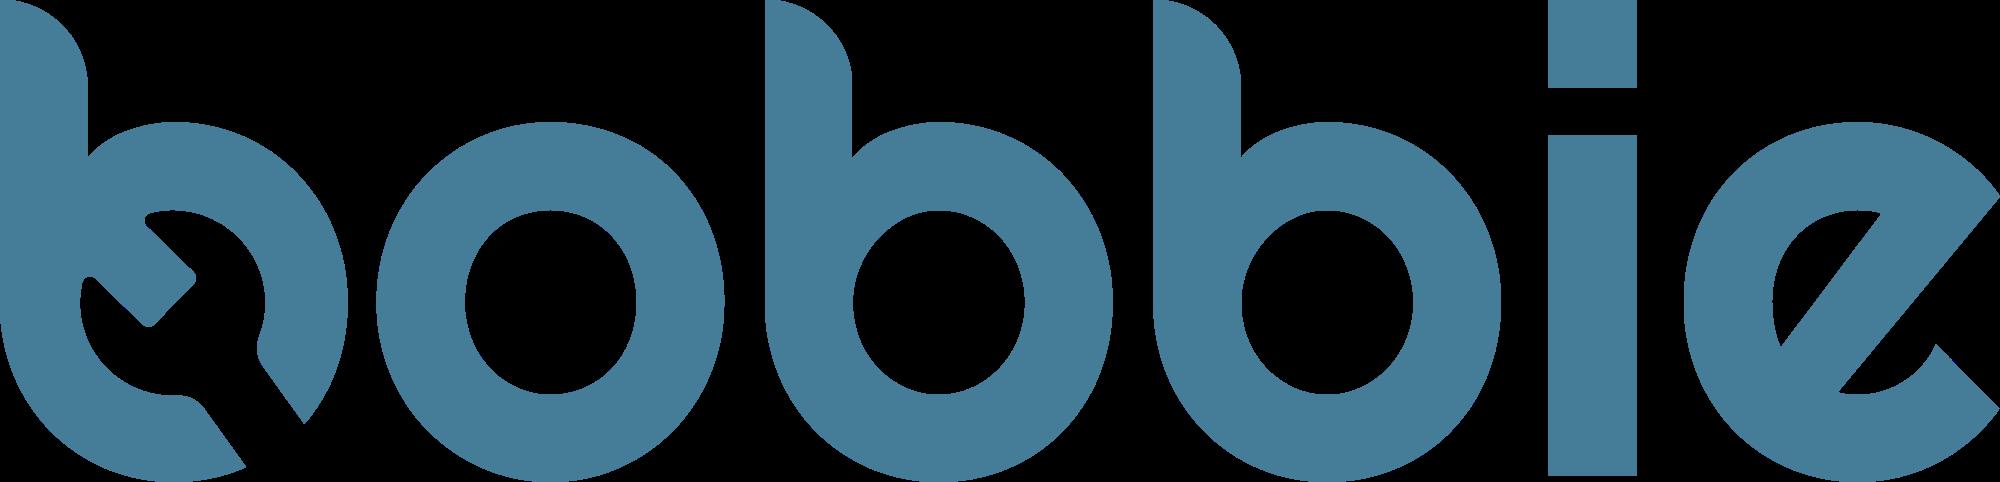 bobbie eCommerce for building materials